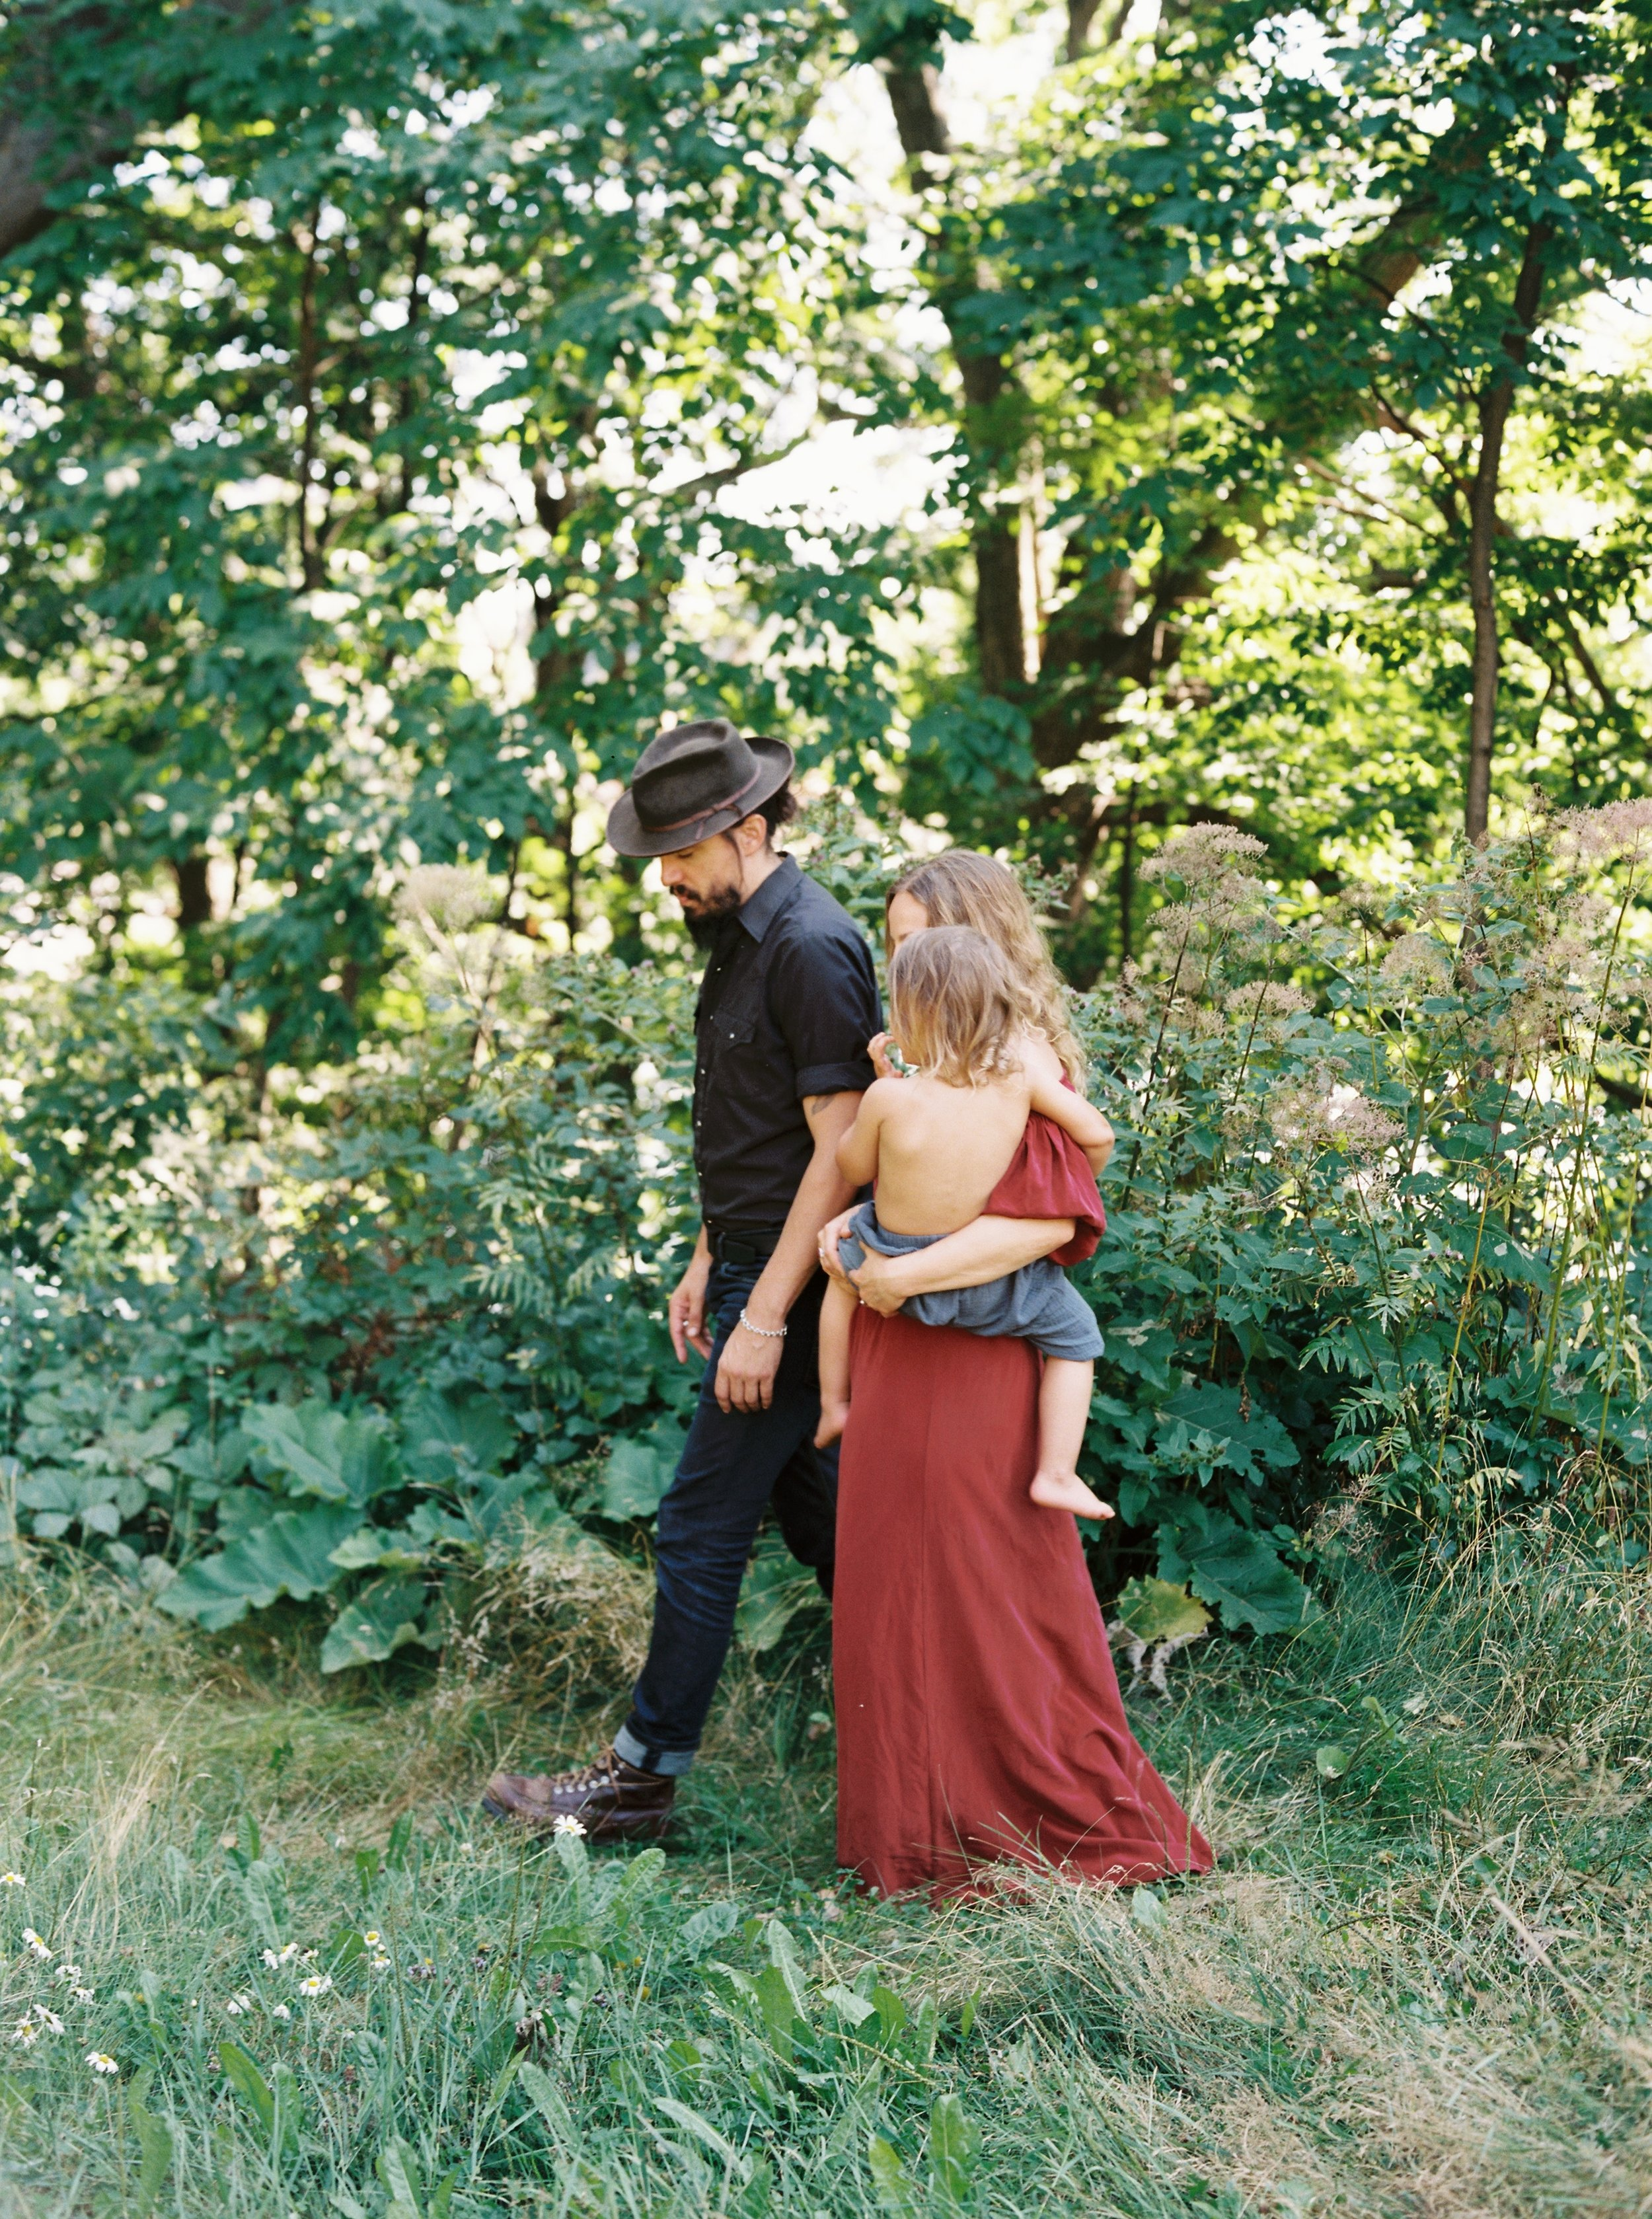 Kyle John l Fine Art Wedding Photography l Chicago, Copenhagen, California, New York, Destination l Blog l Cory Chisel and Adriel Denae_The Refuge_3